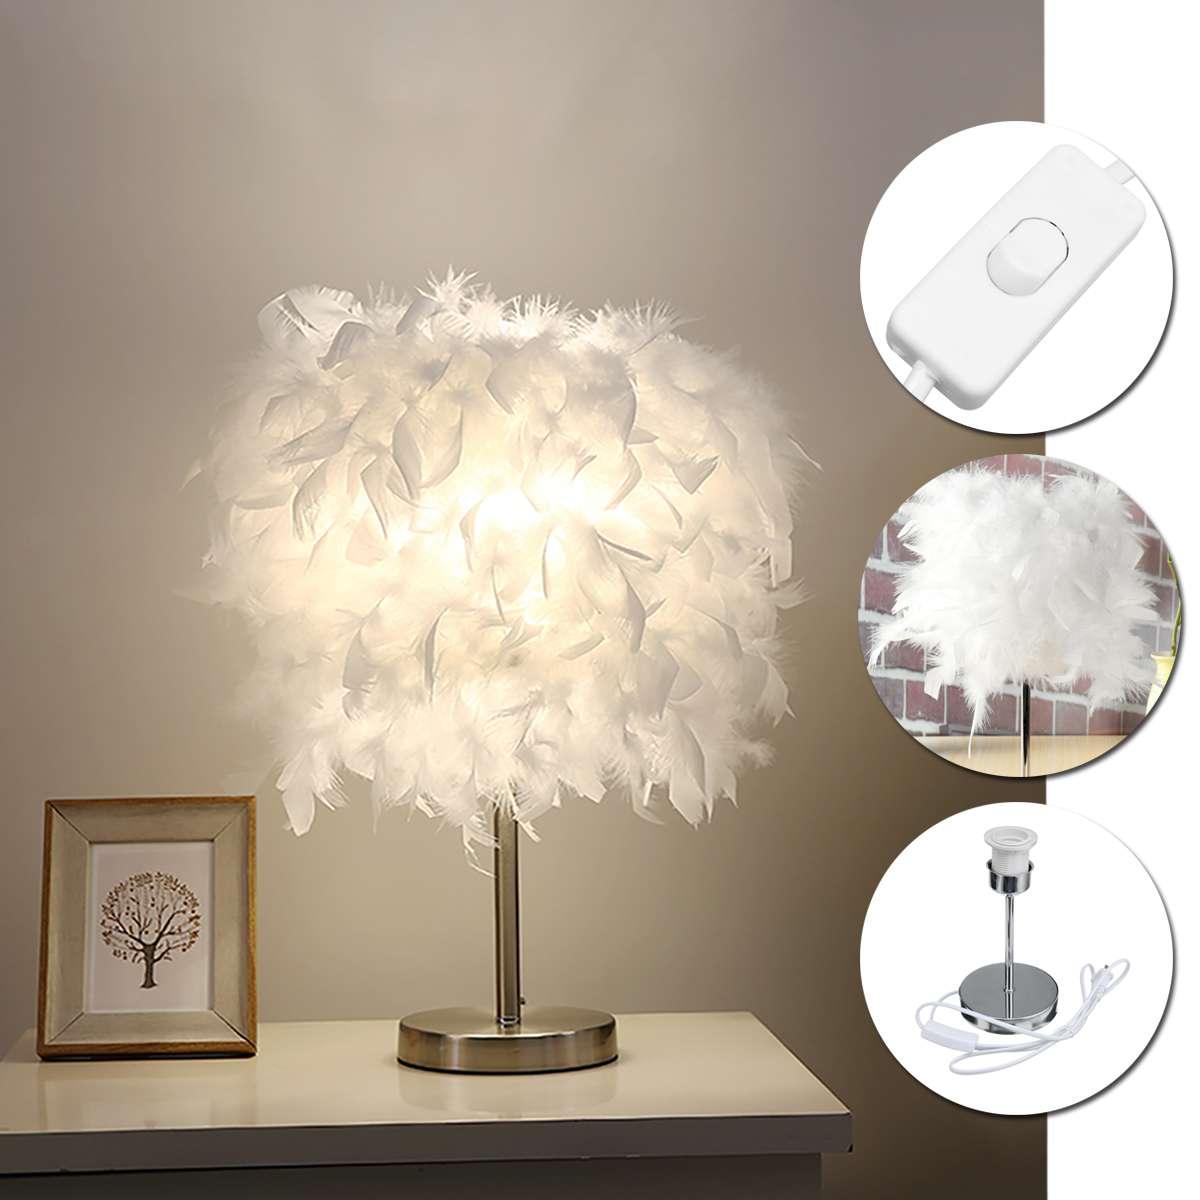 Feather Shade โลหะตารางโคมไฟ 220V ข้างเตียง Vintage Night Light Christmas Decor Vintage ห้องนอน Study Room สีขาว